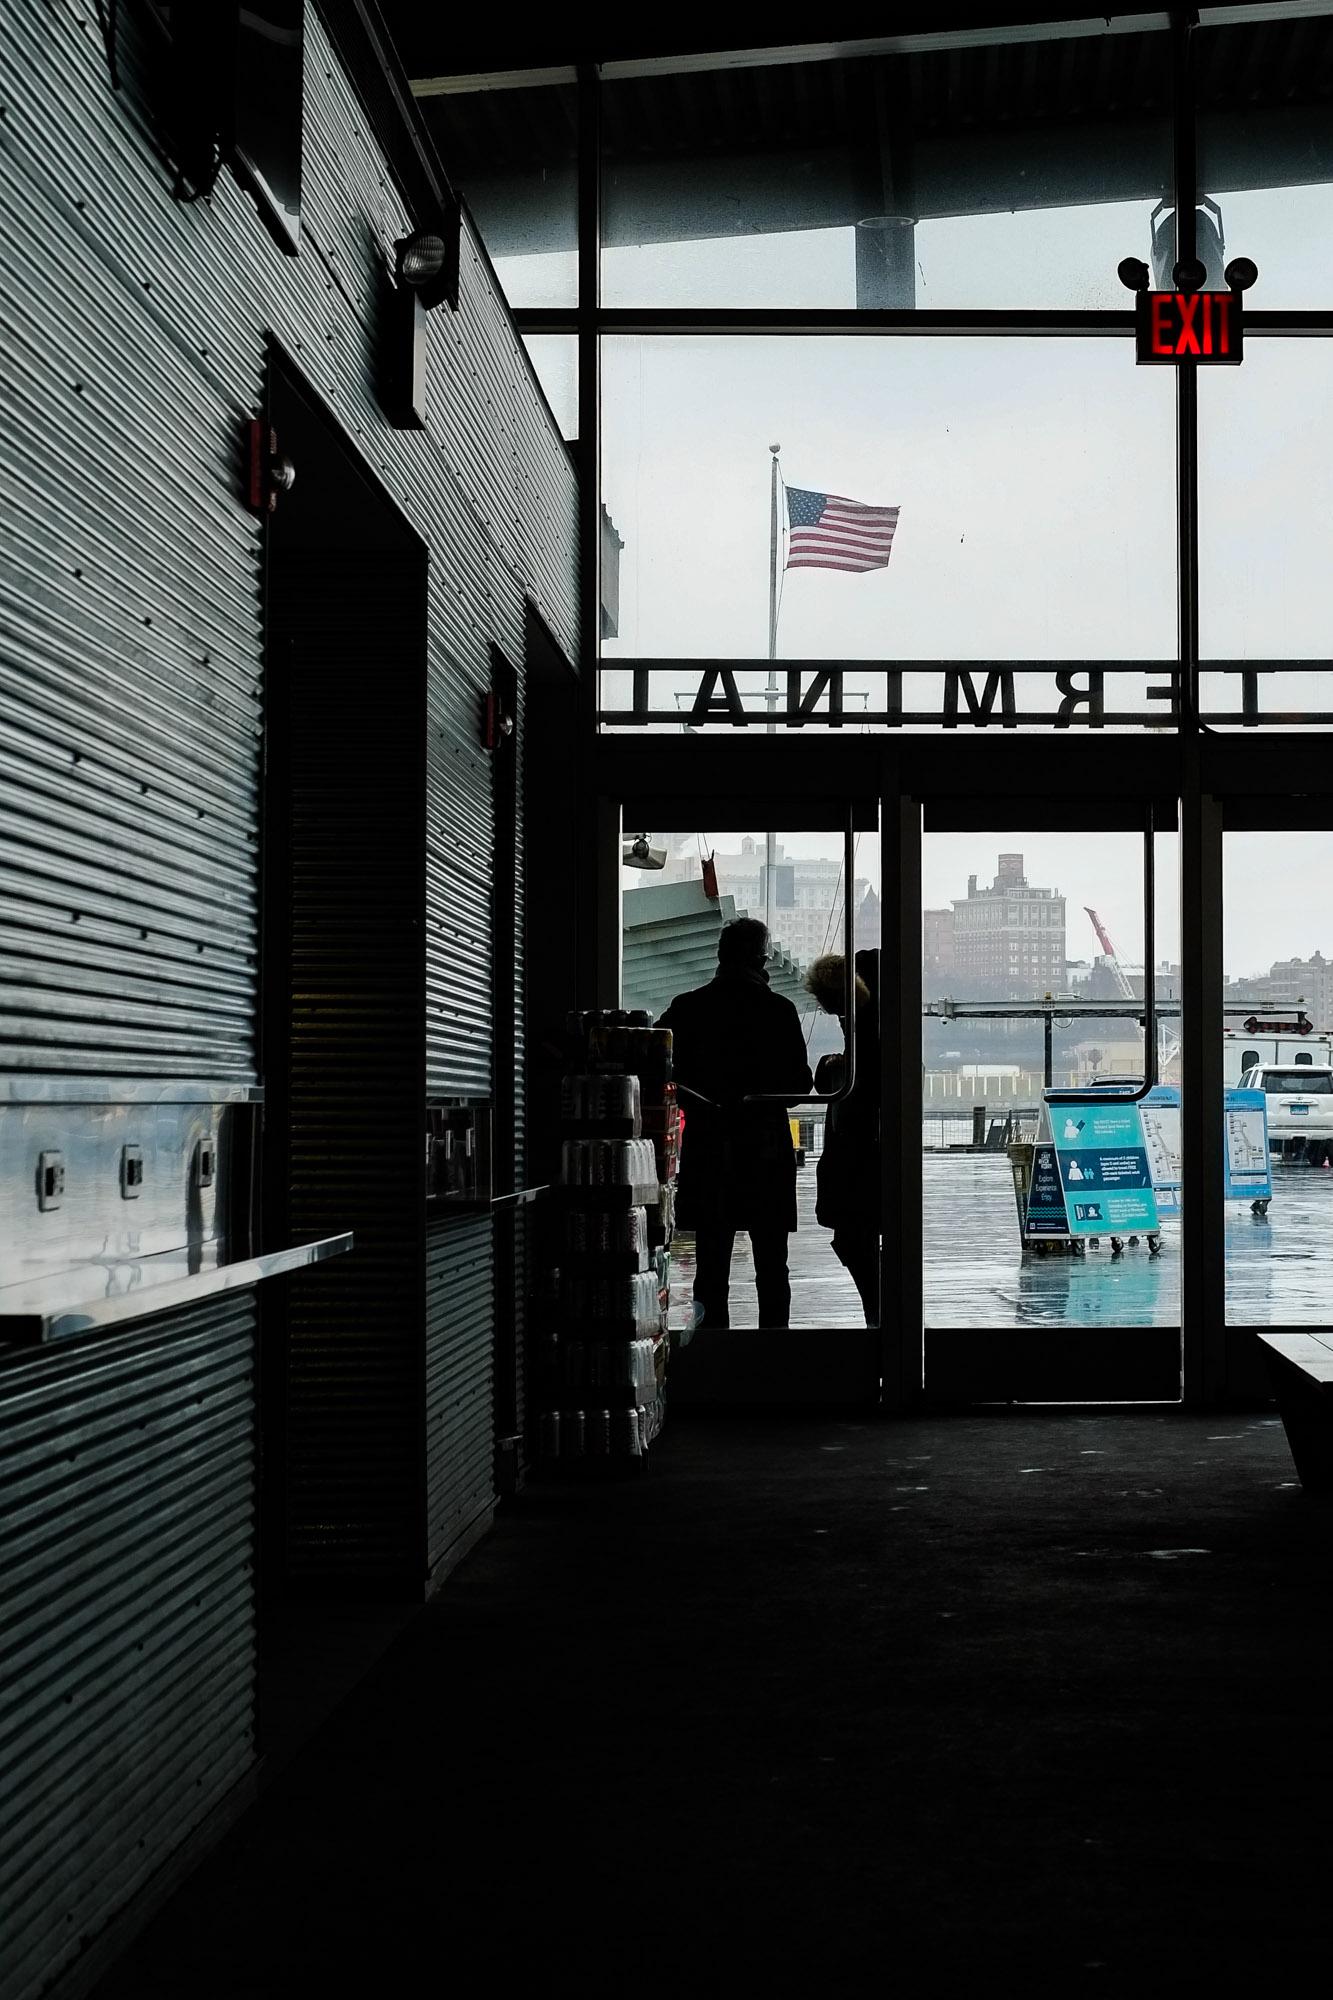 A man waiting for the ferry. Fuji X-pro1, Fuji XF 35mm f/1.4.